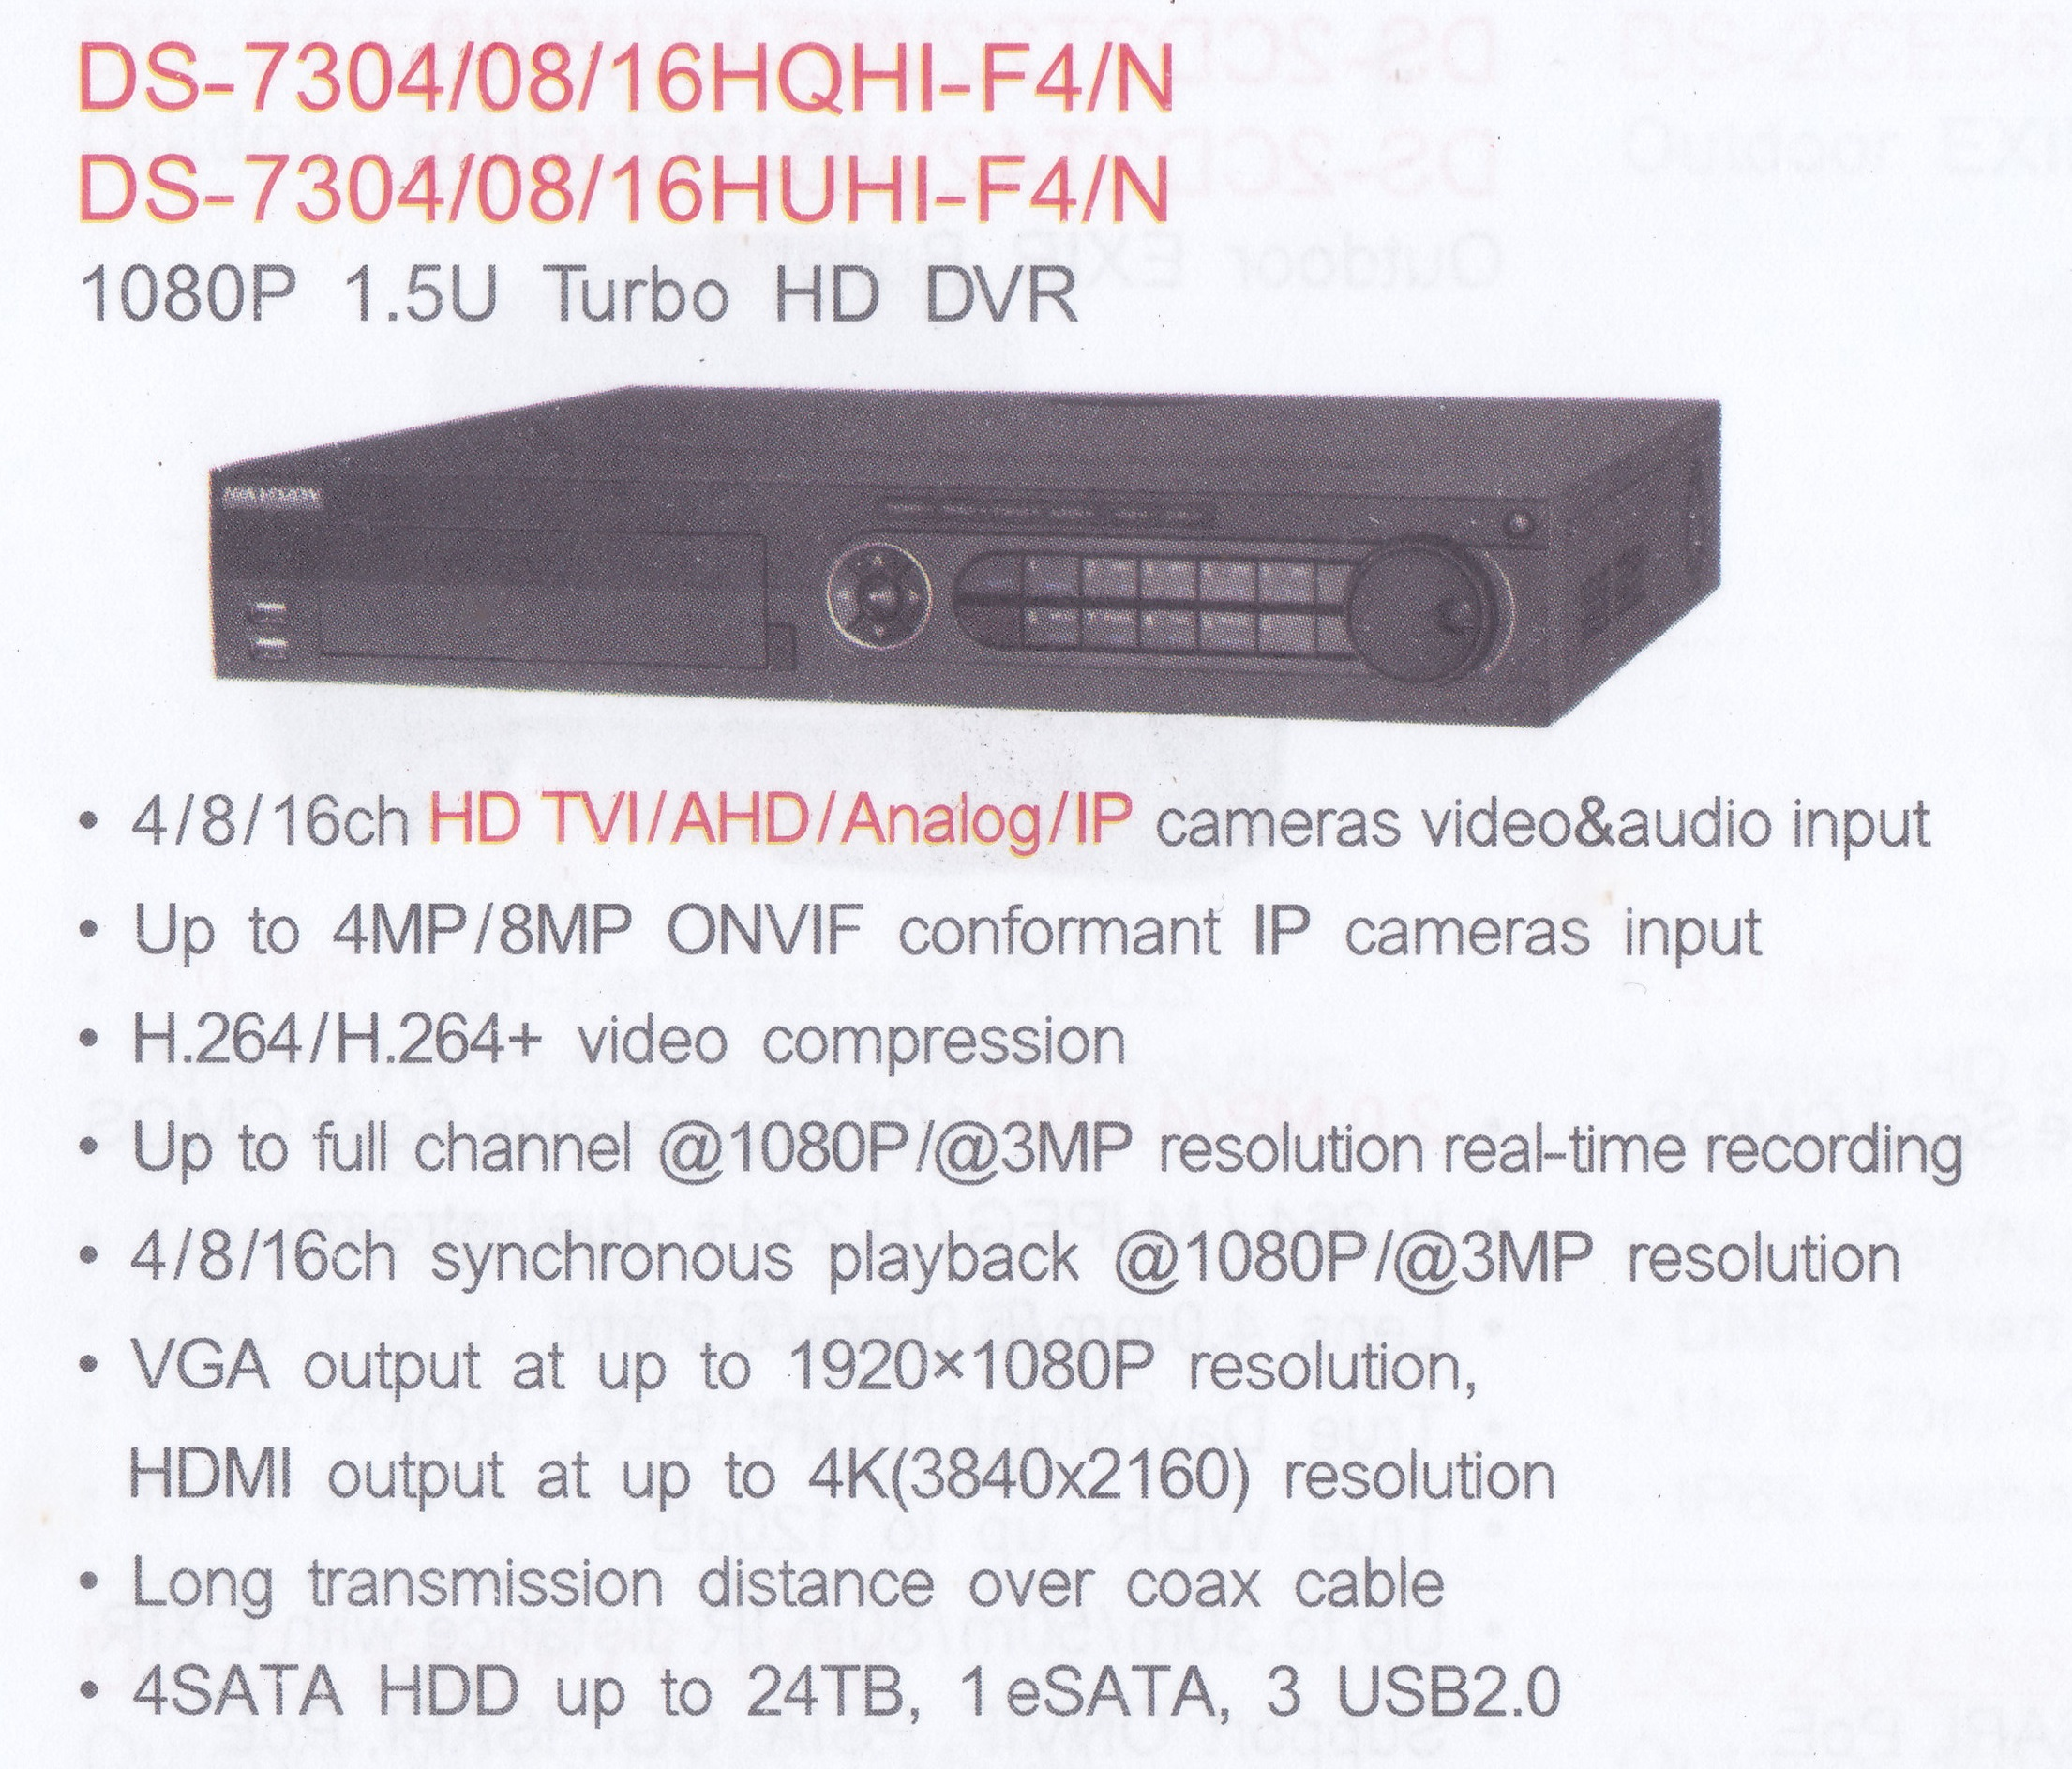 DS-7304 08 16HQHI-F4N